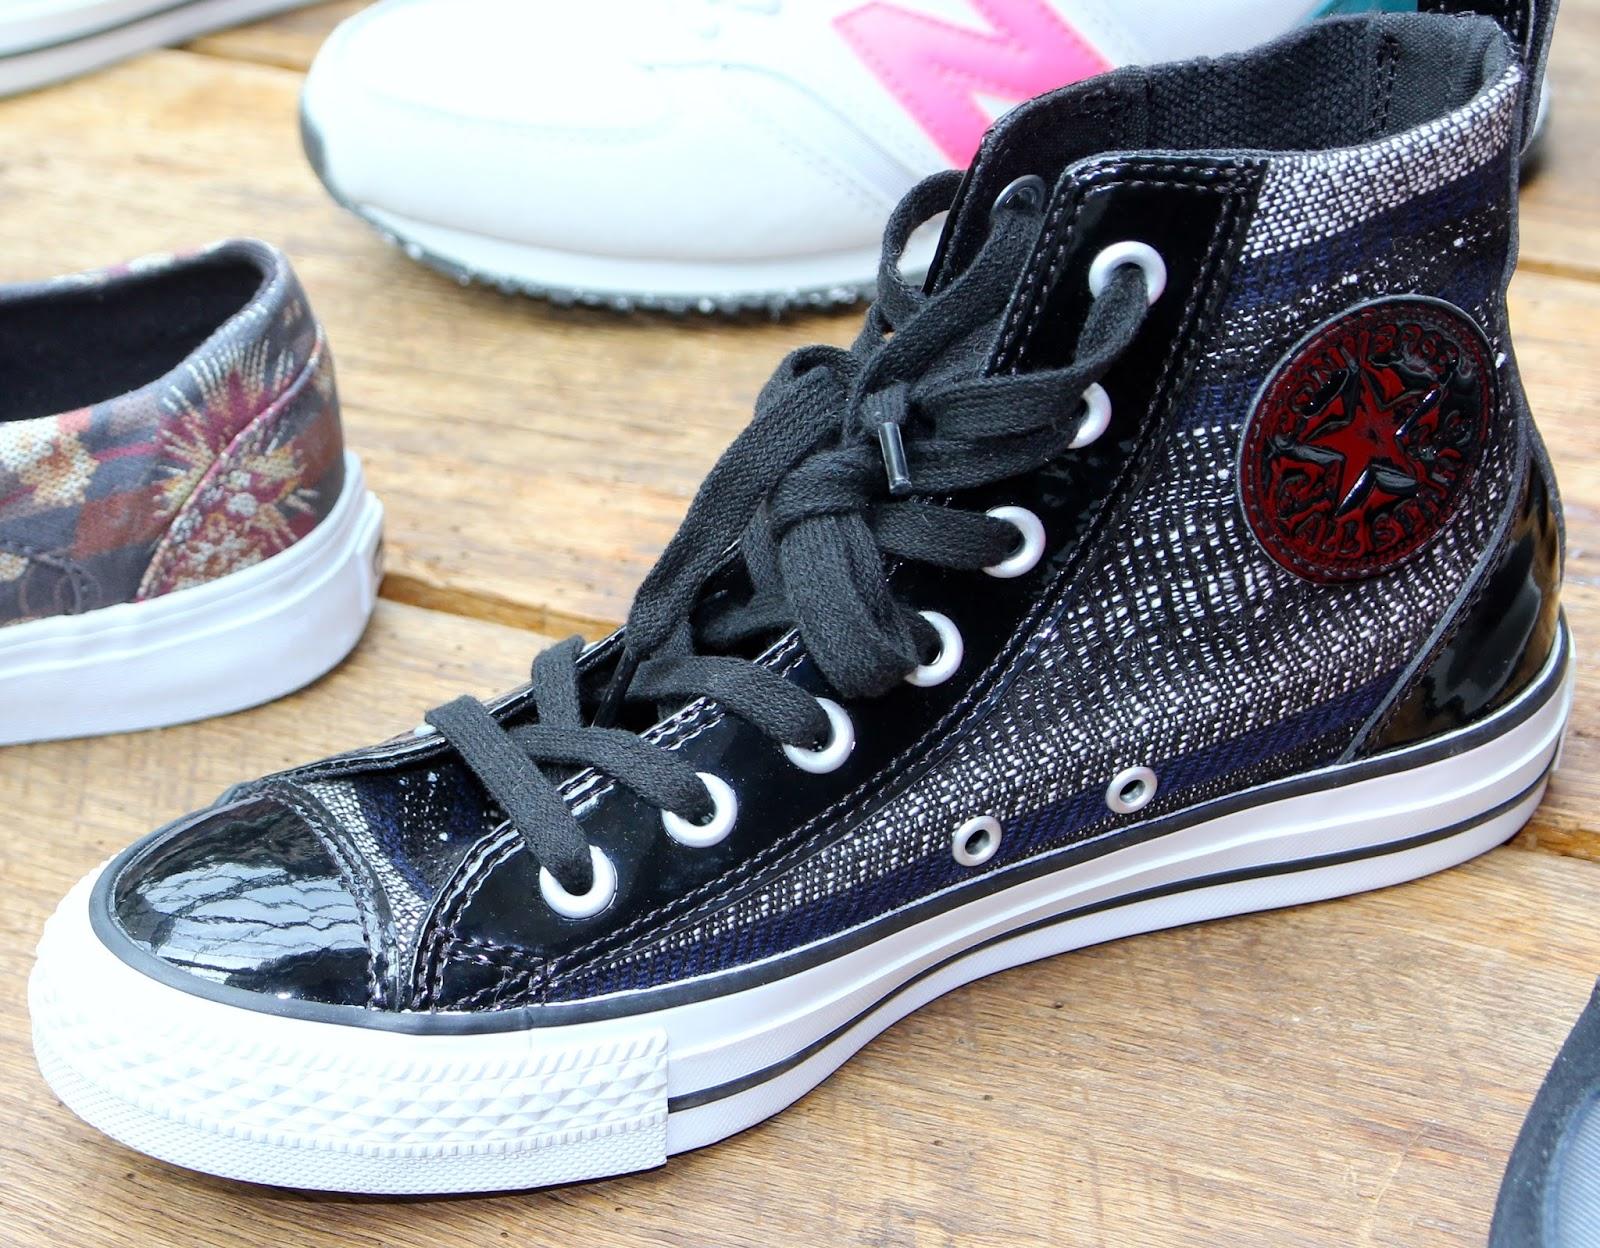 60c9cc9d5ac009 Converse Chuck Taylor Al Star High Top  69.95 DSW price- kicks...get mixed  textured uppers---